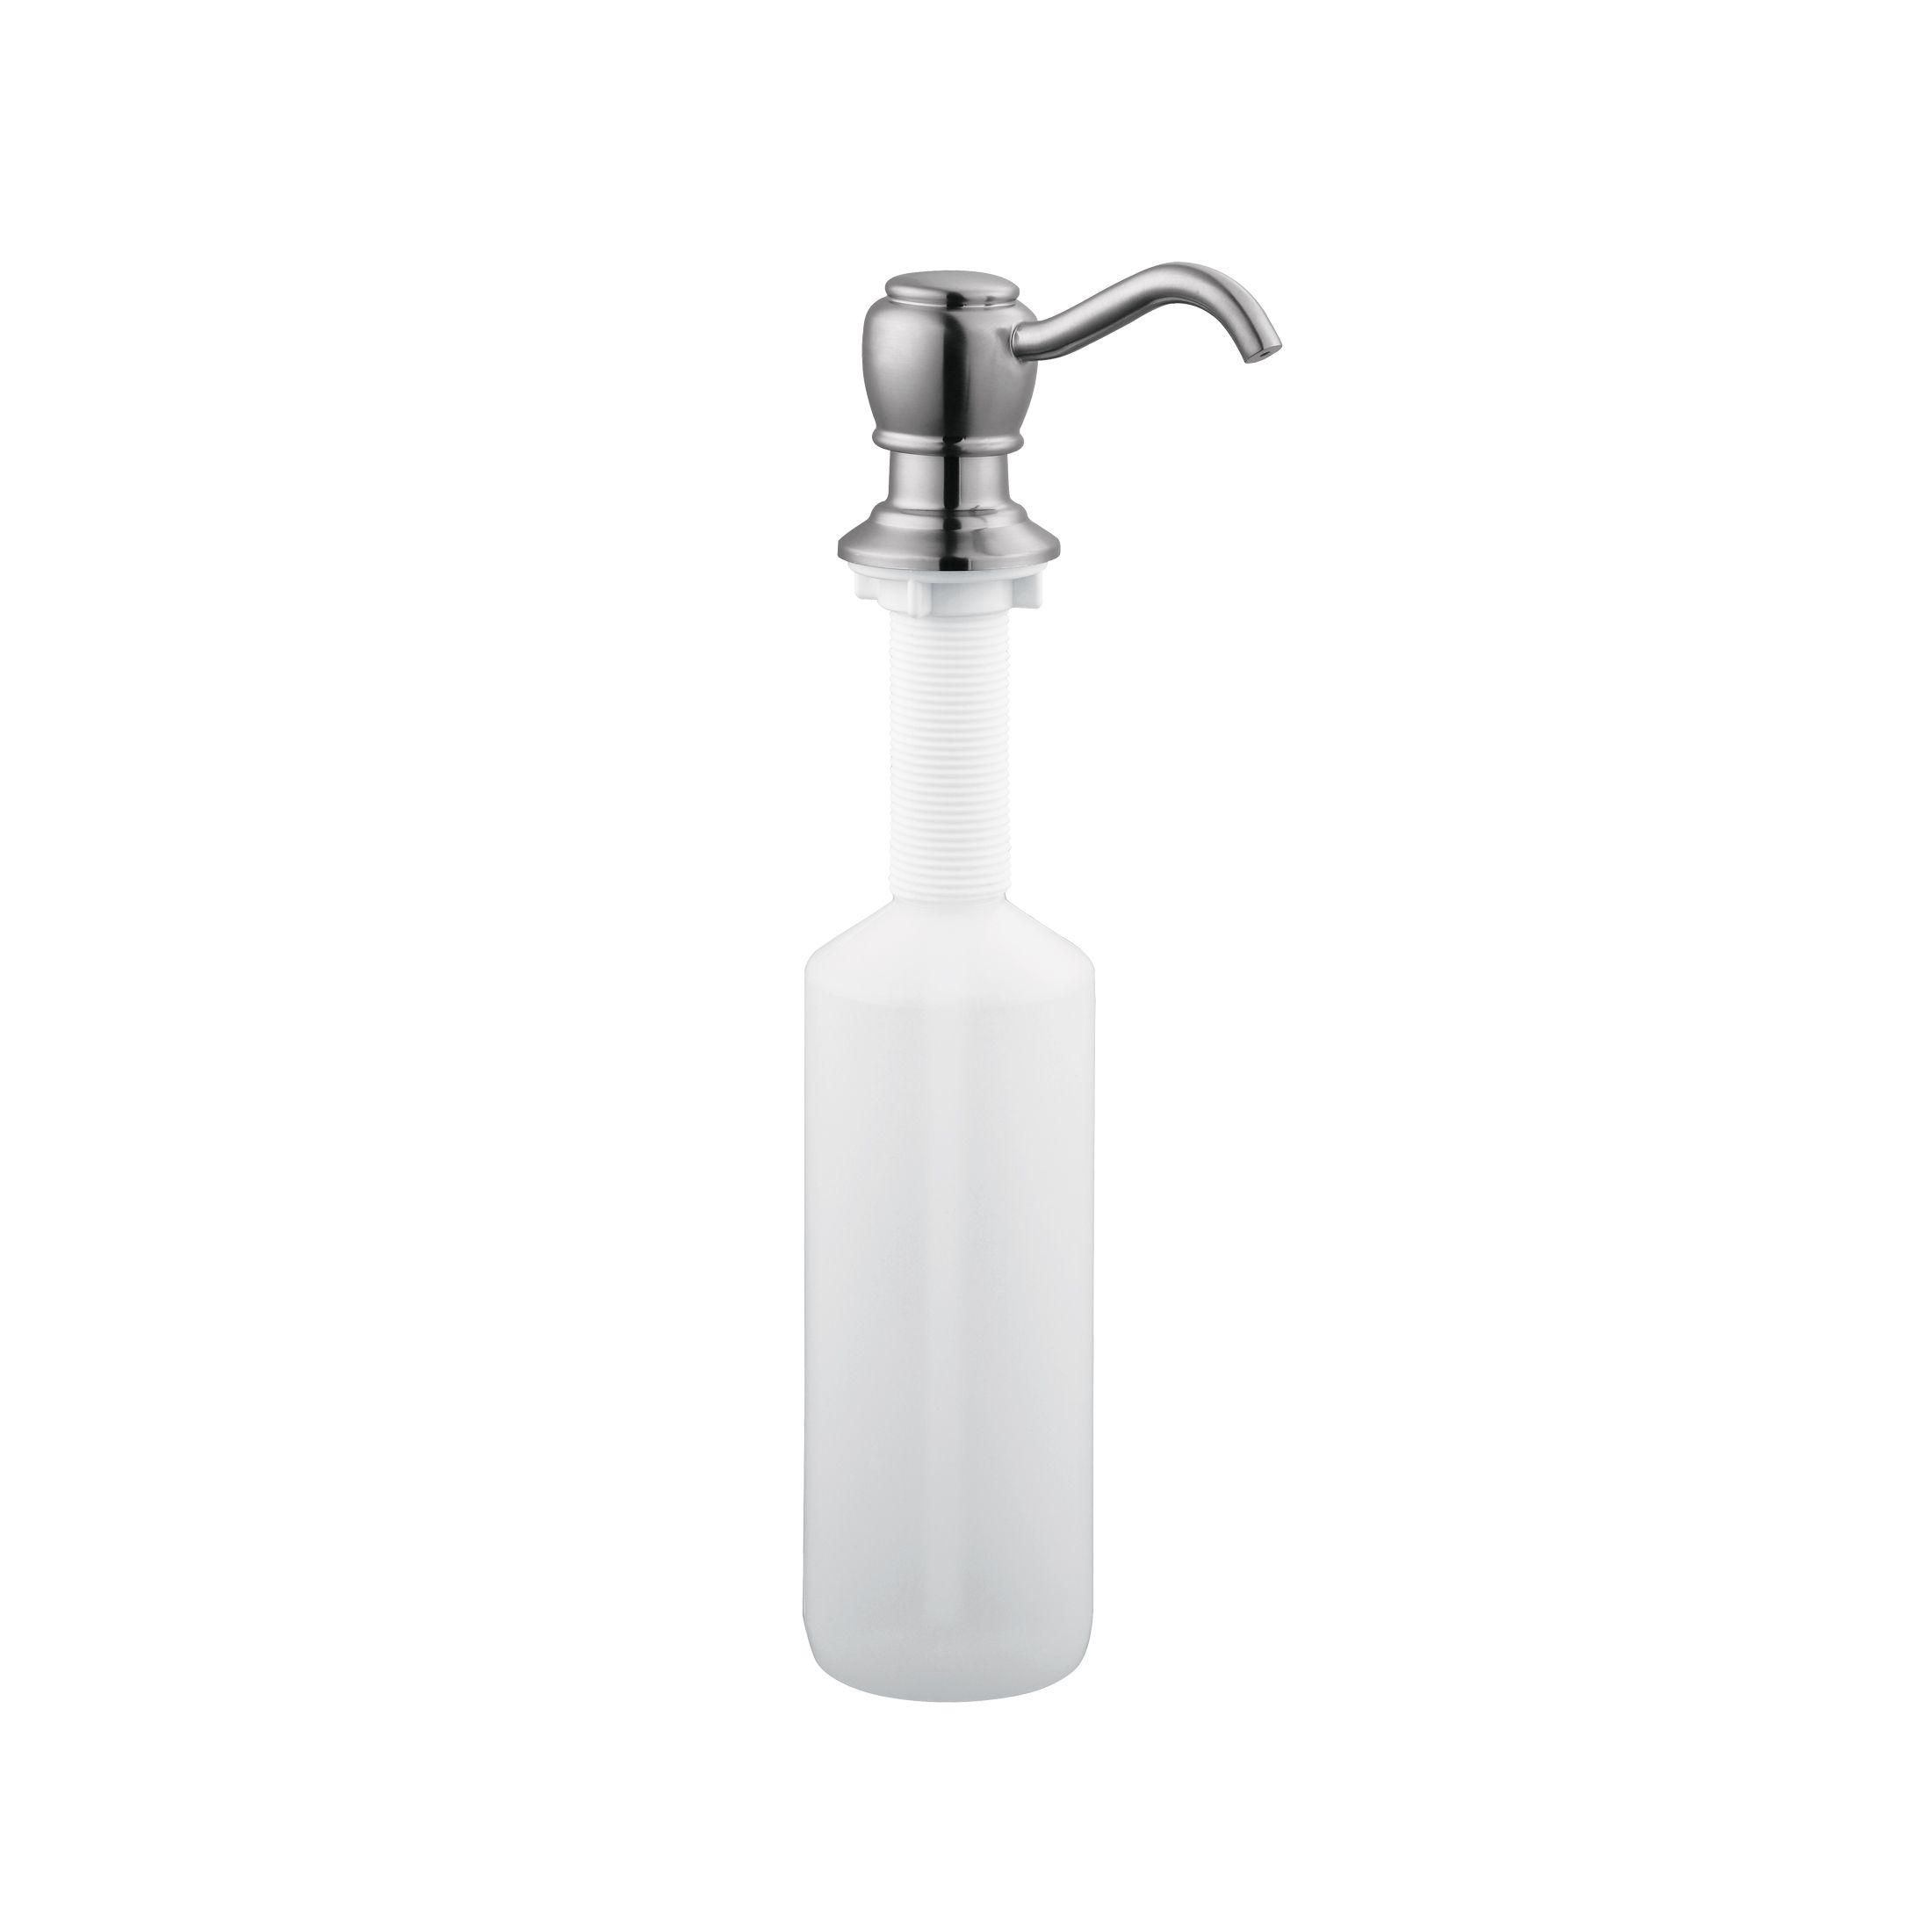 Soap Dispenser, Satin Nickel #522250